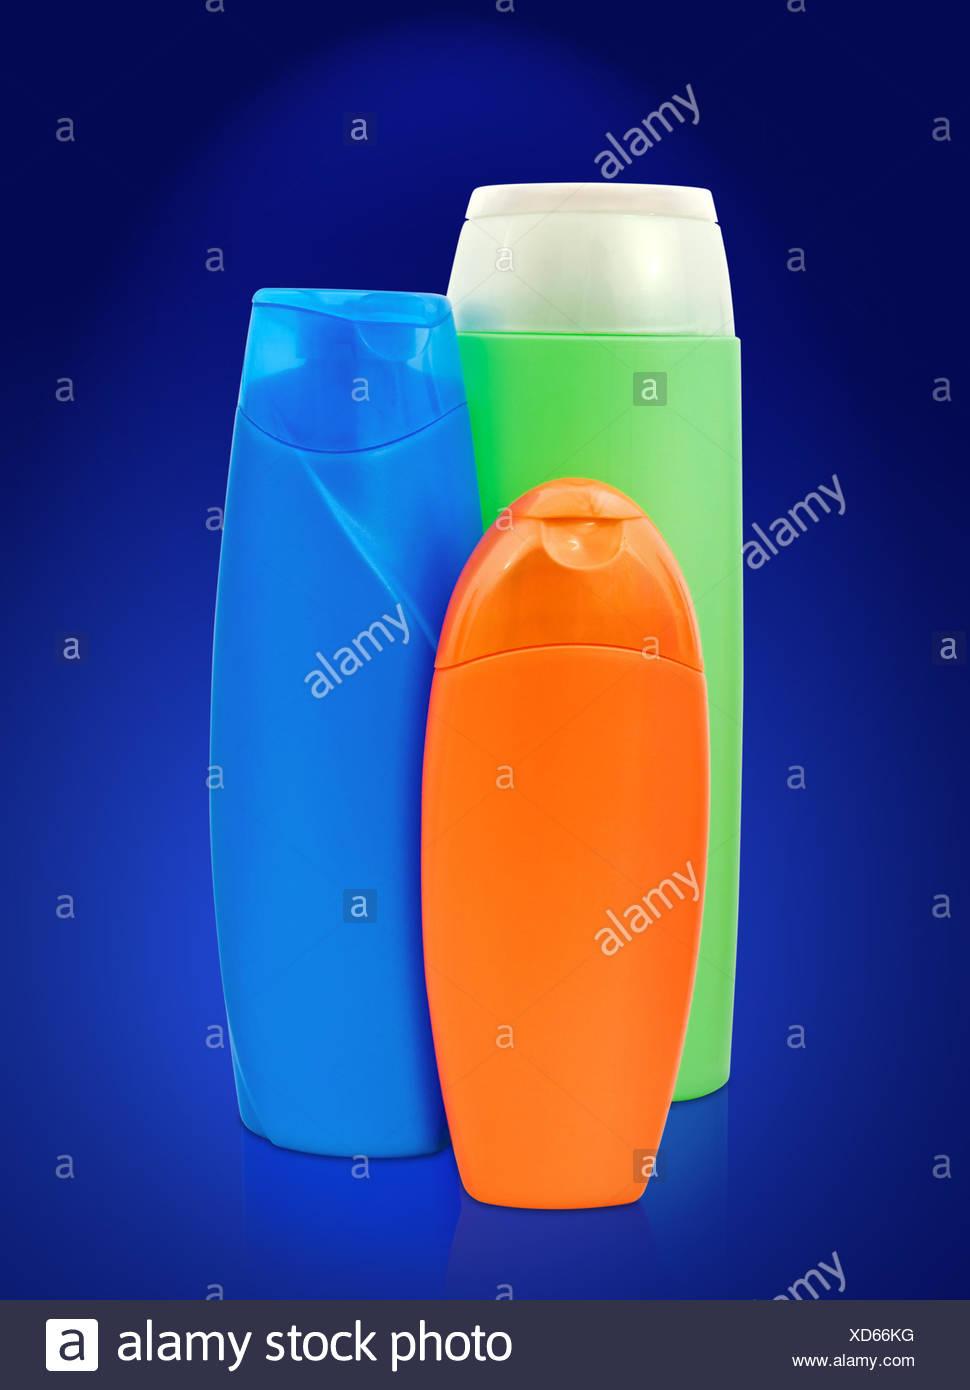 Toiletries Bottles - Stock Image